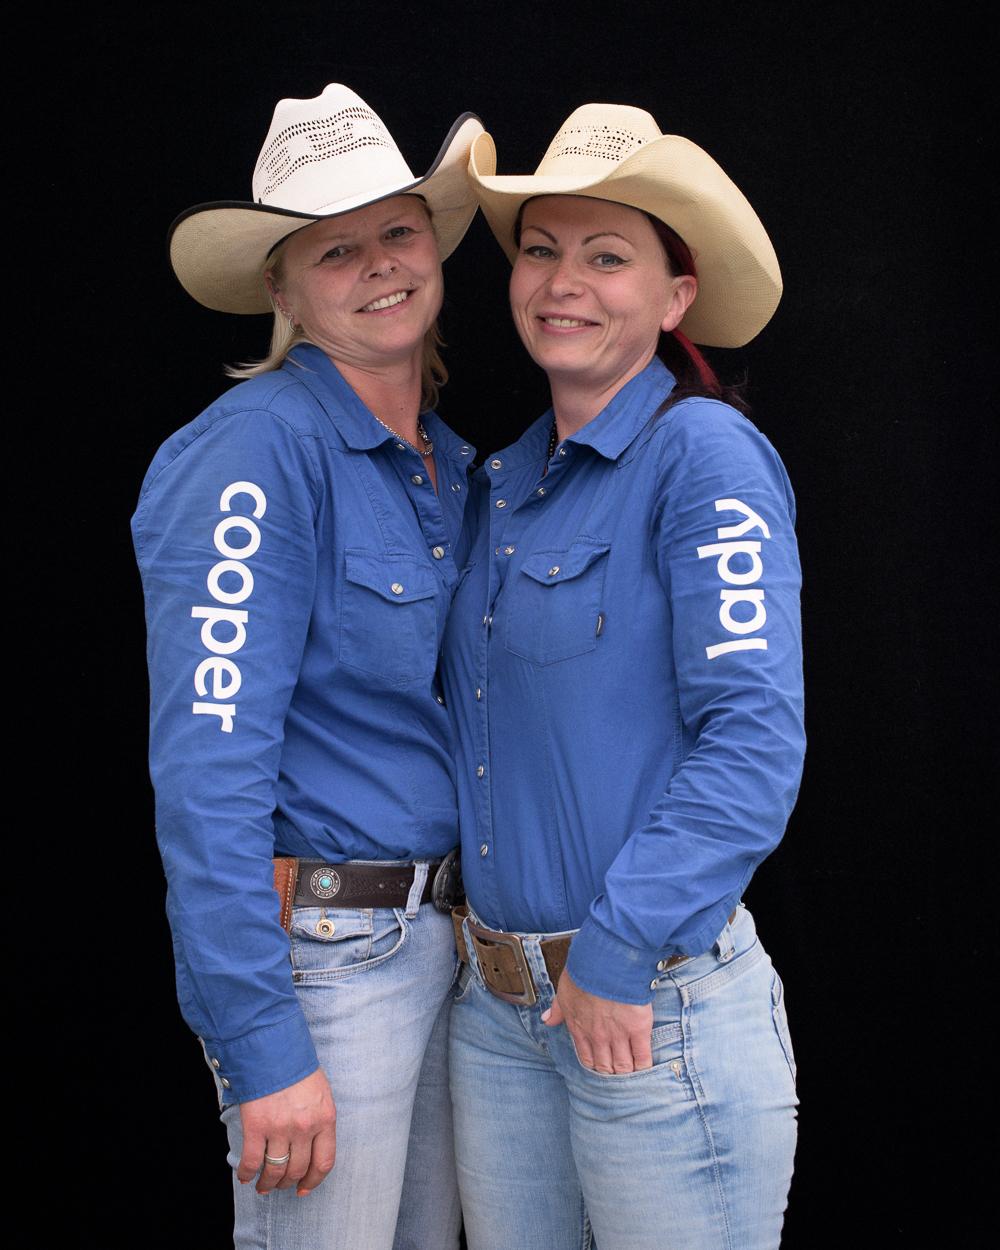 cowboys-9326-Edit.jpg